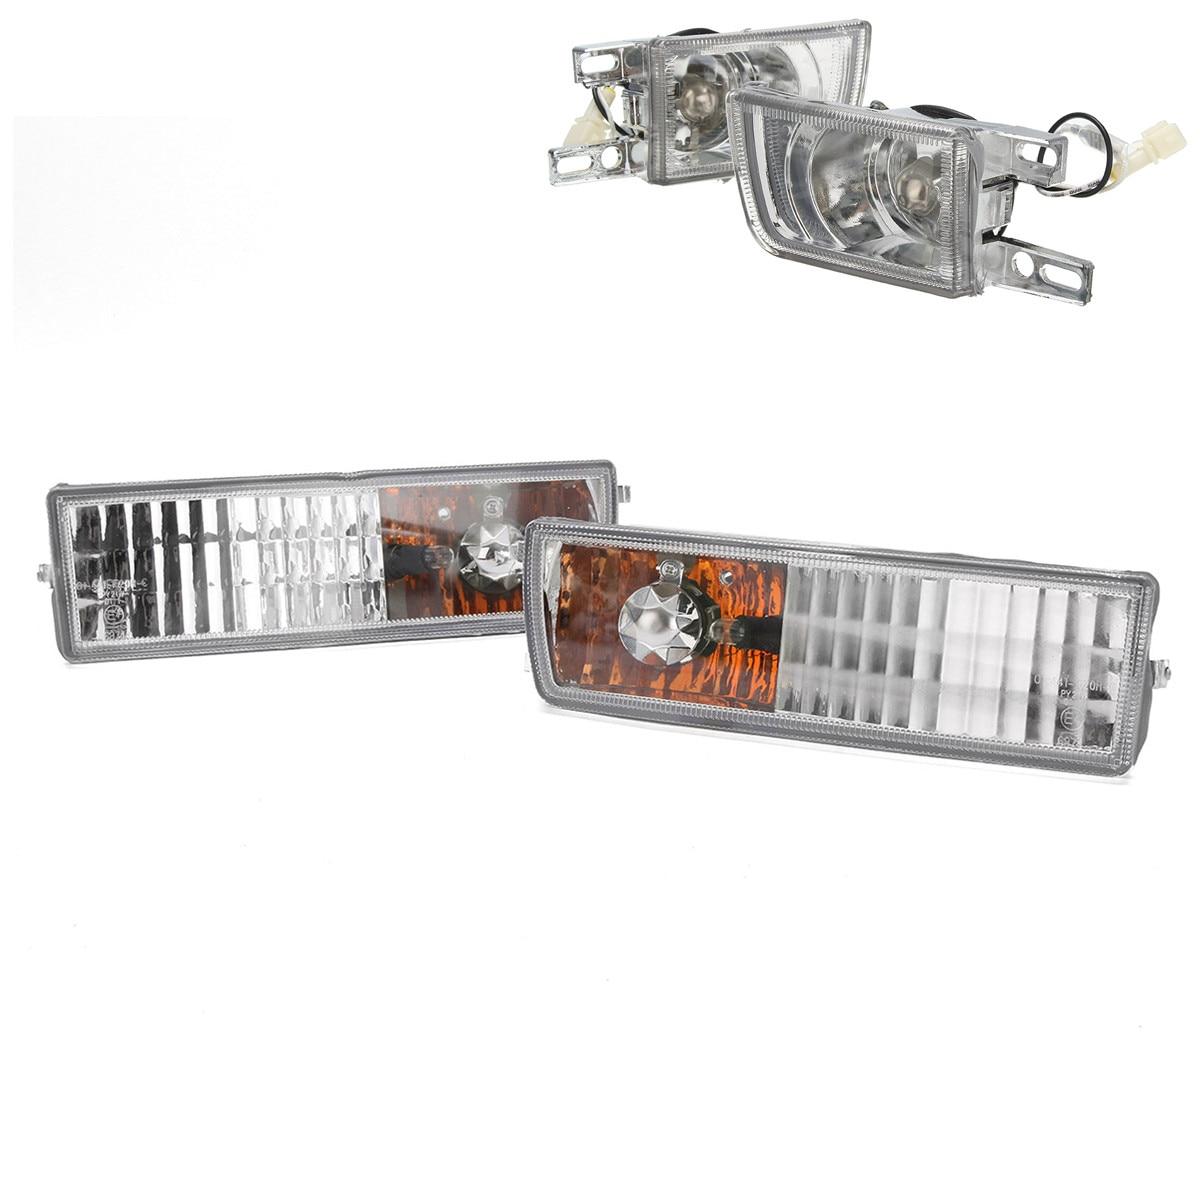 Pair H3 Front Bumper Fog Light+Pair 7507 Turn Signal For VW MK3 Jetta Golf 92-97 front bumper convex lens fog light for vw touran 1t1 1t2 l 1t0941699 r 1t0941700 foglamps